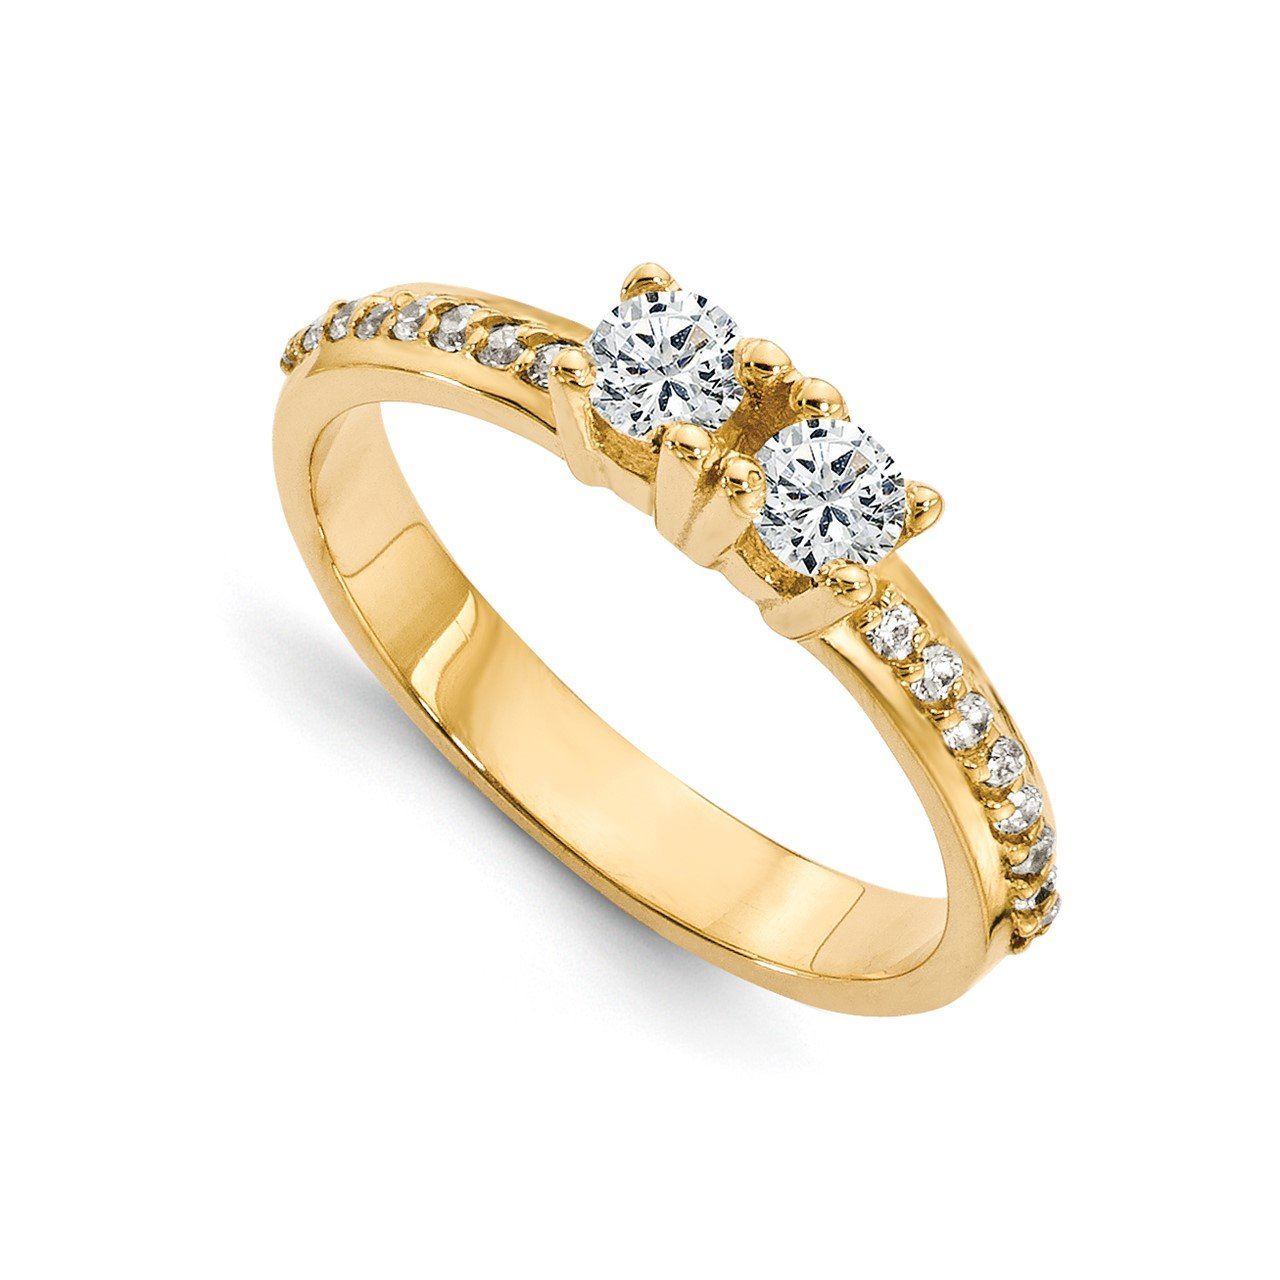 14ky A Diamond 2-stone Ring Semi-Mount - 4.8 mm center stones